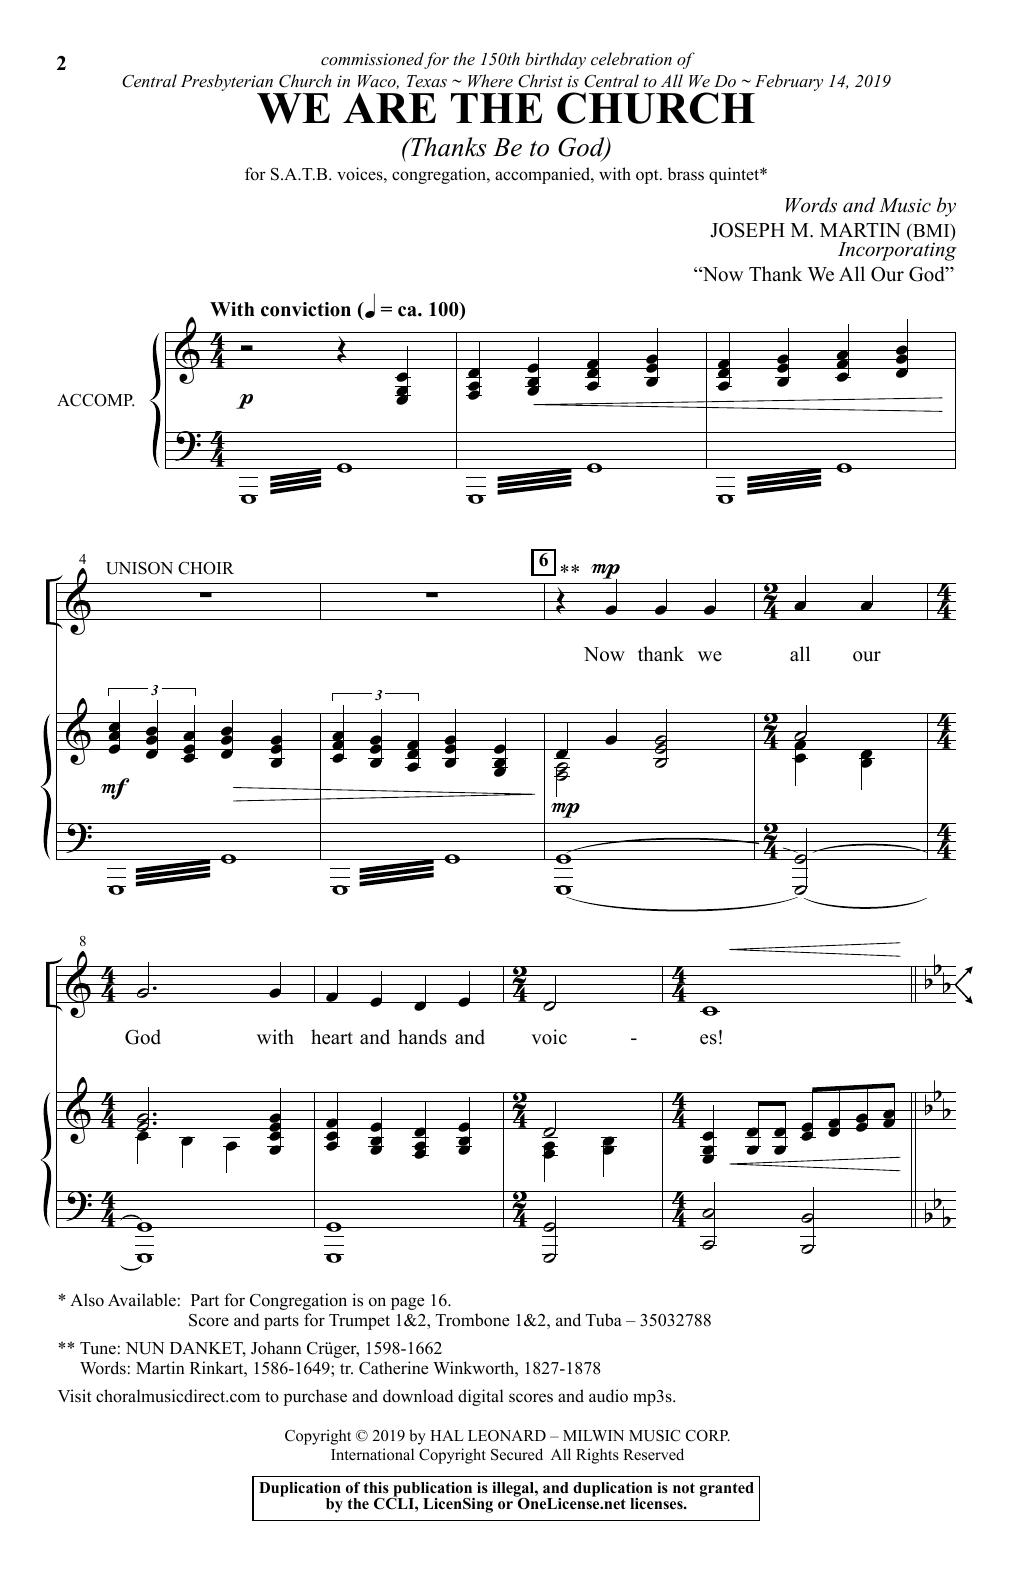 We Are The Church (Thanks Be To God) by Joseph M  Martin SATB Choir Digital  Sheet Music